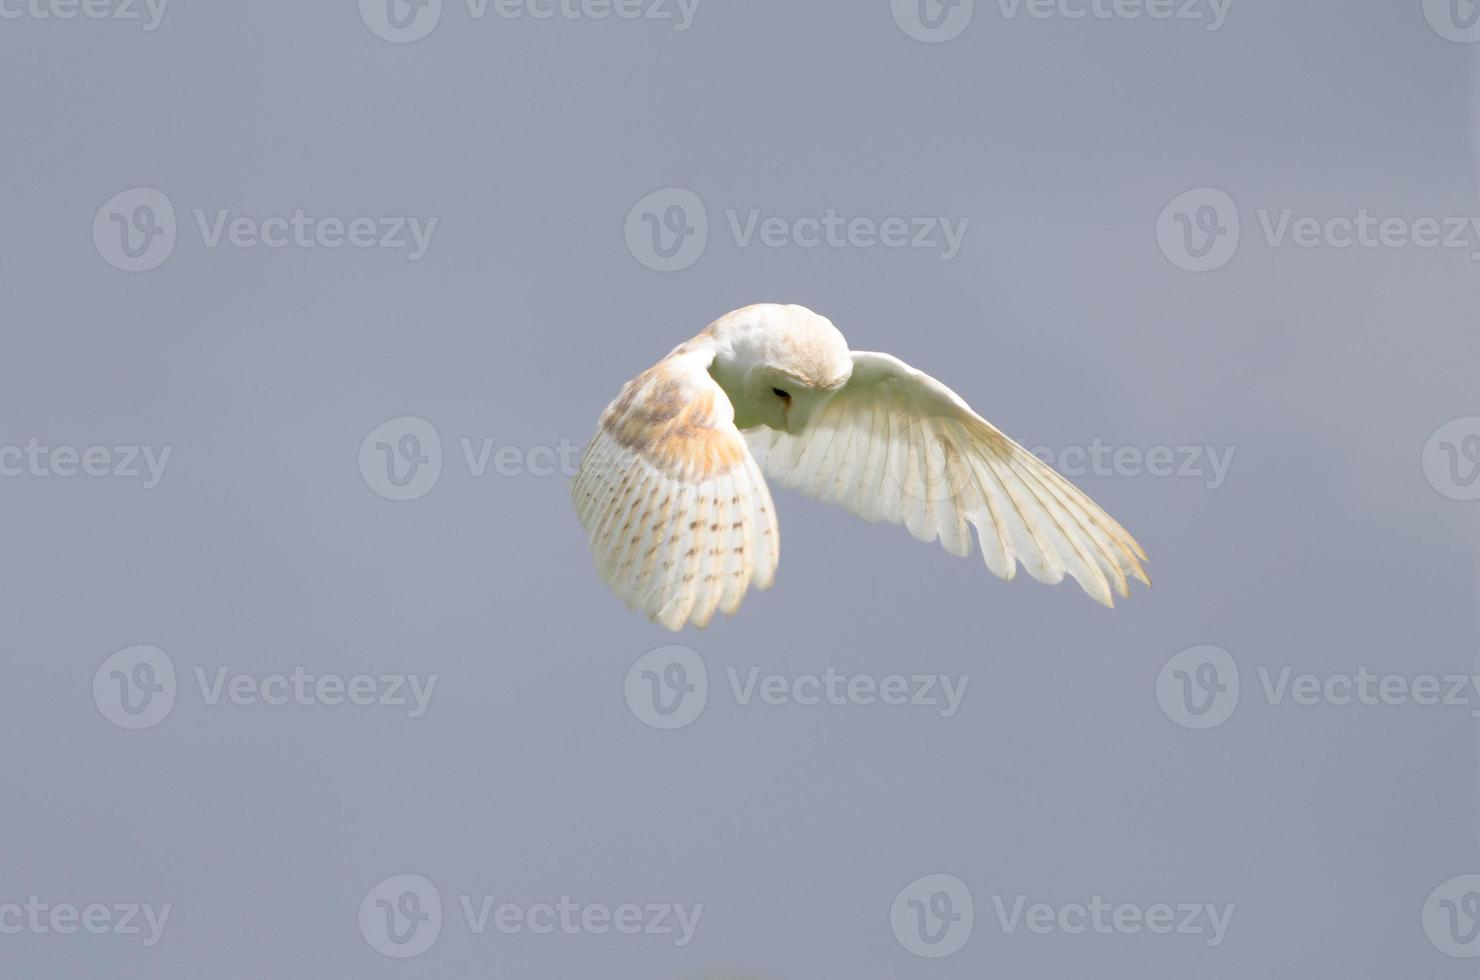 caça de coruja de celeiro voador (tyto alba) foto